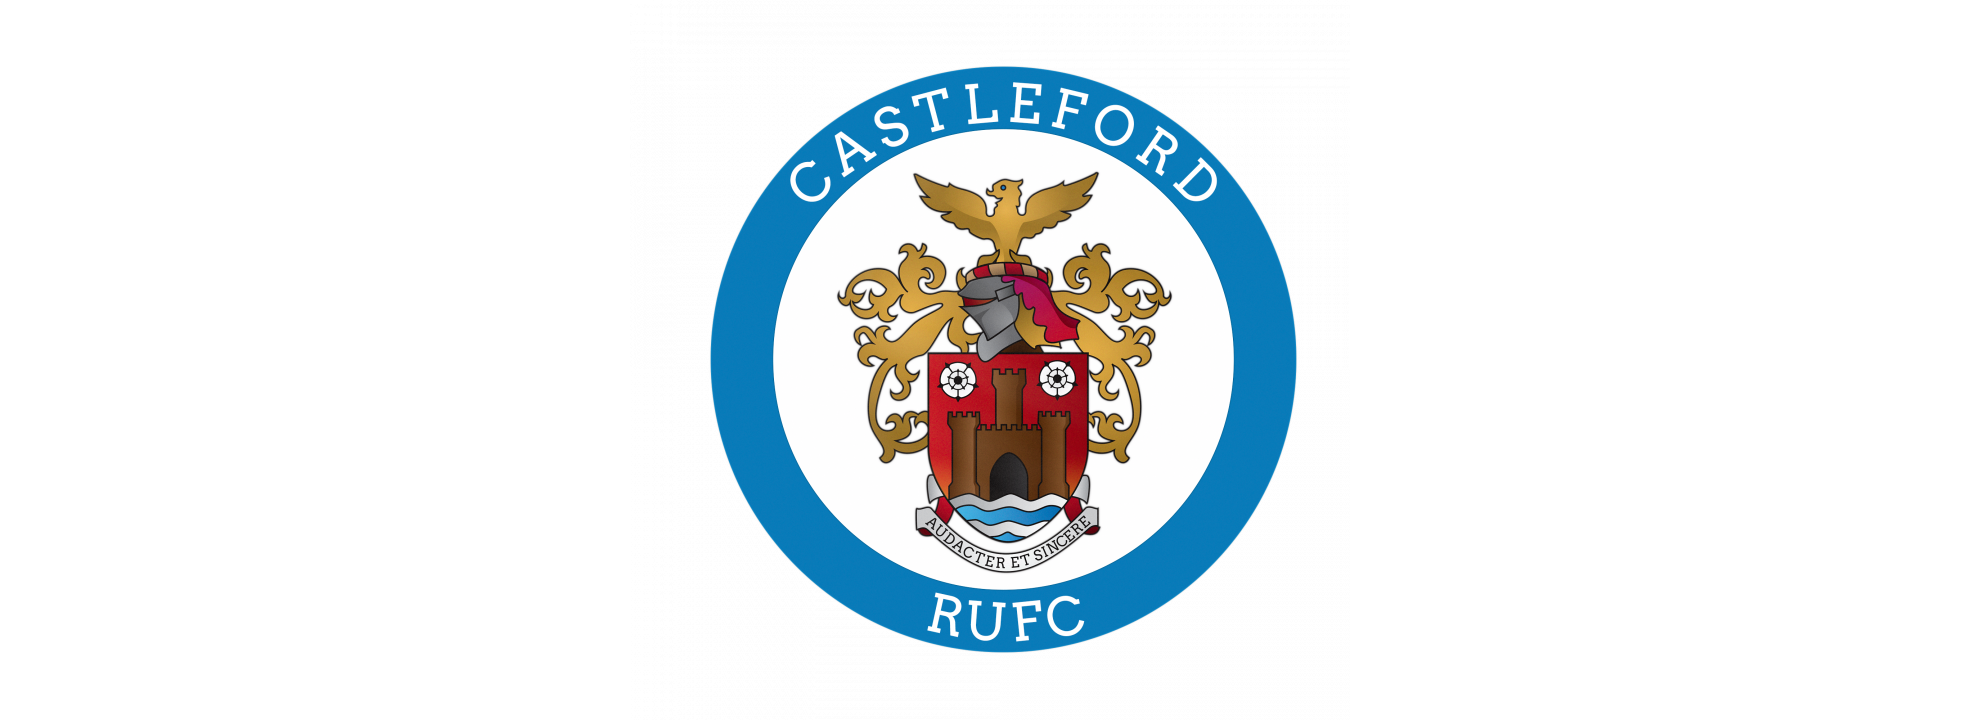 HAF Fun at Castleford RUFC Banner